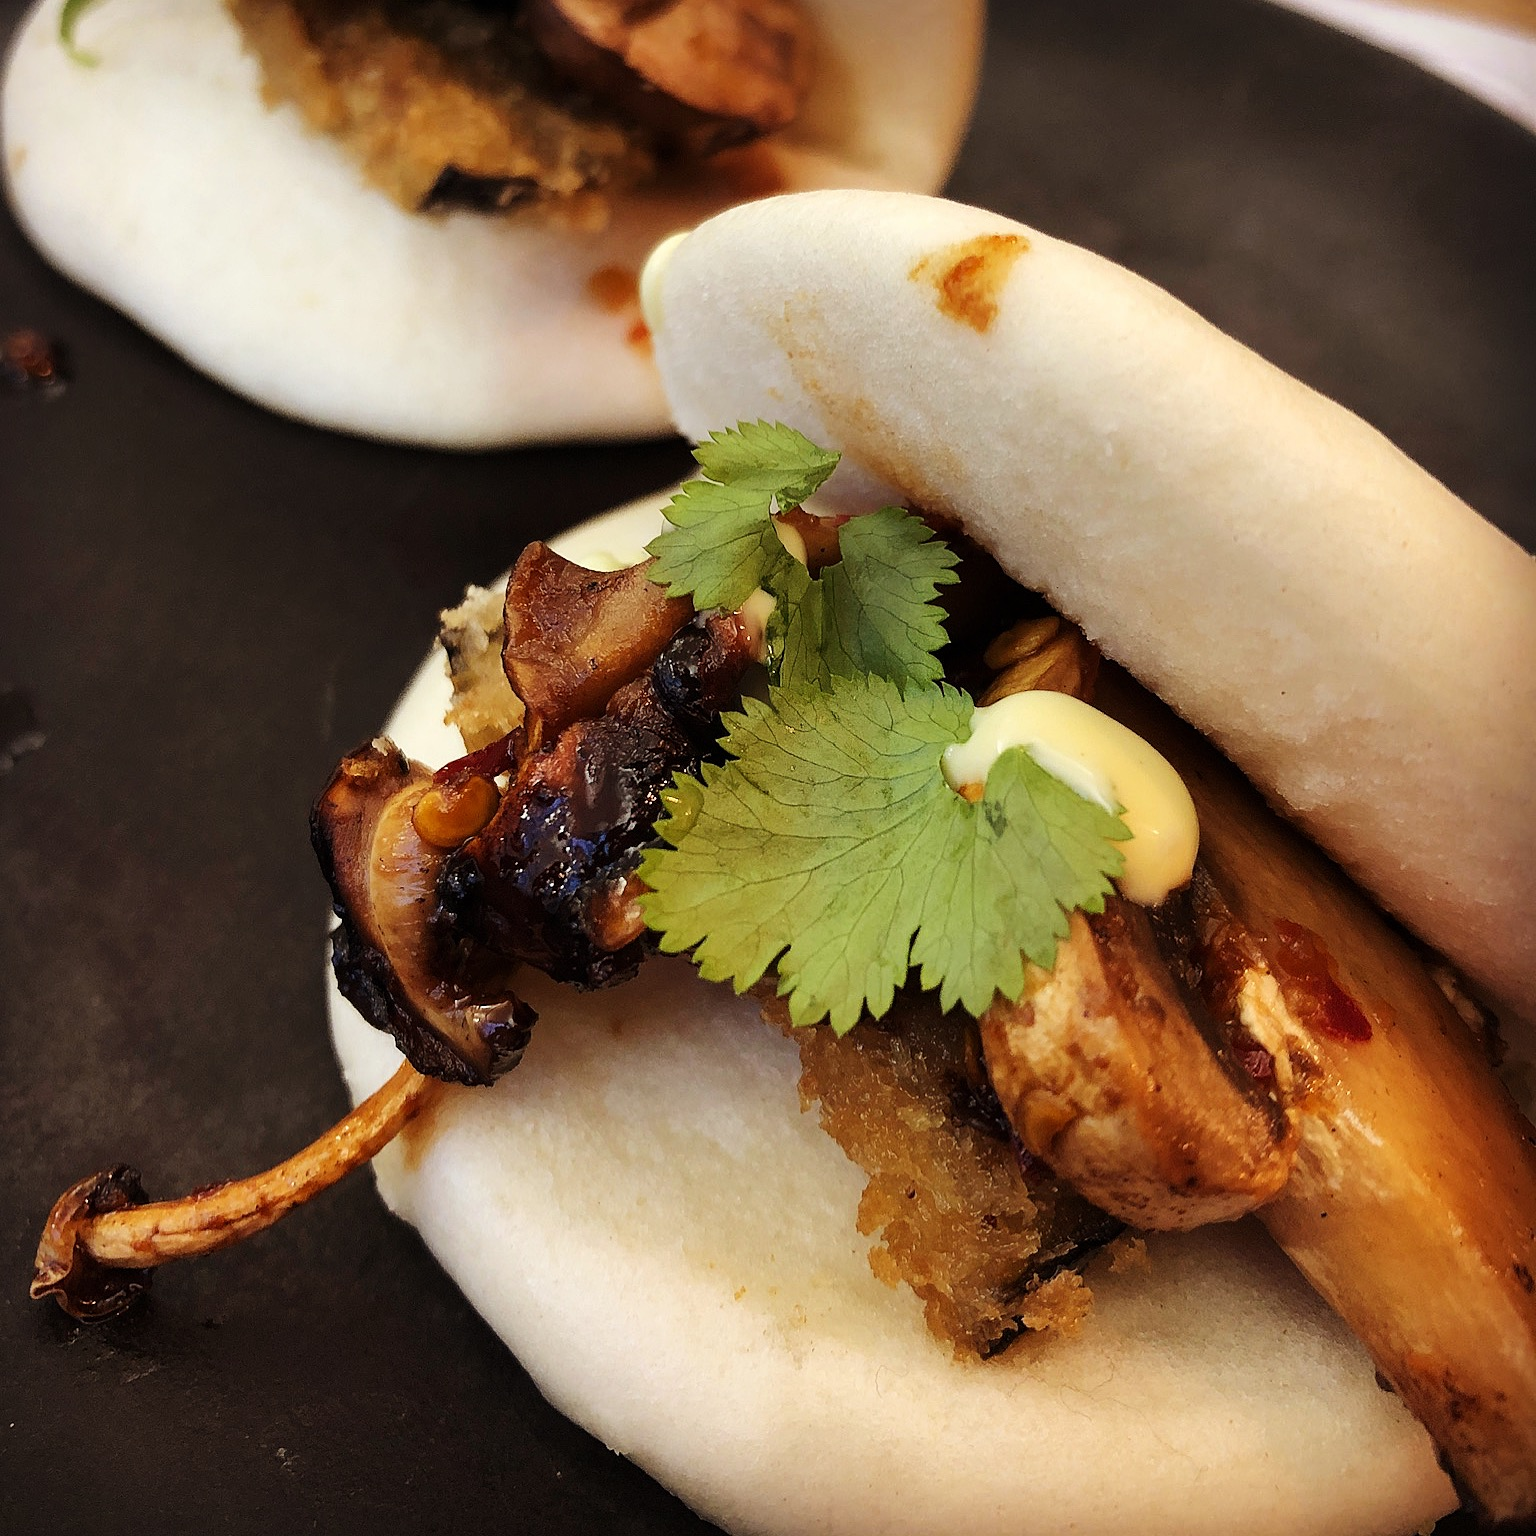 ixed Mushroom Hirata Buns - two fluffy asian buns stuffed with mixed mushrooms, panko aubergine, coriander and mayonnaise.